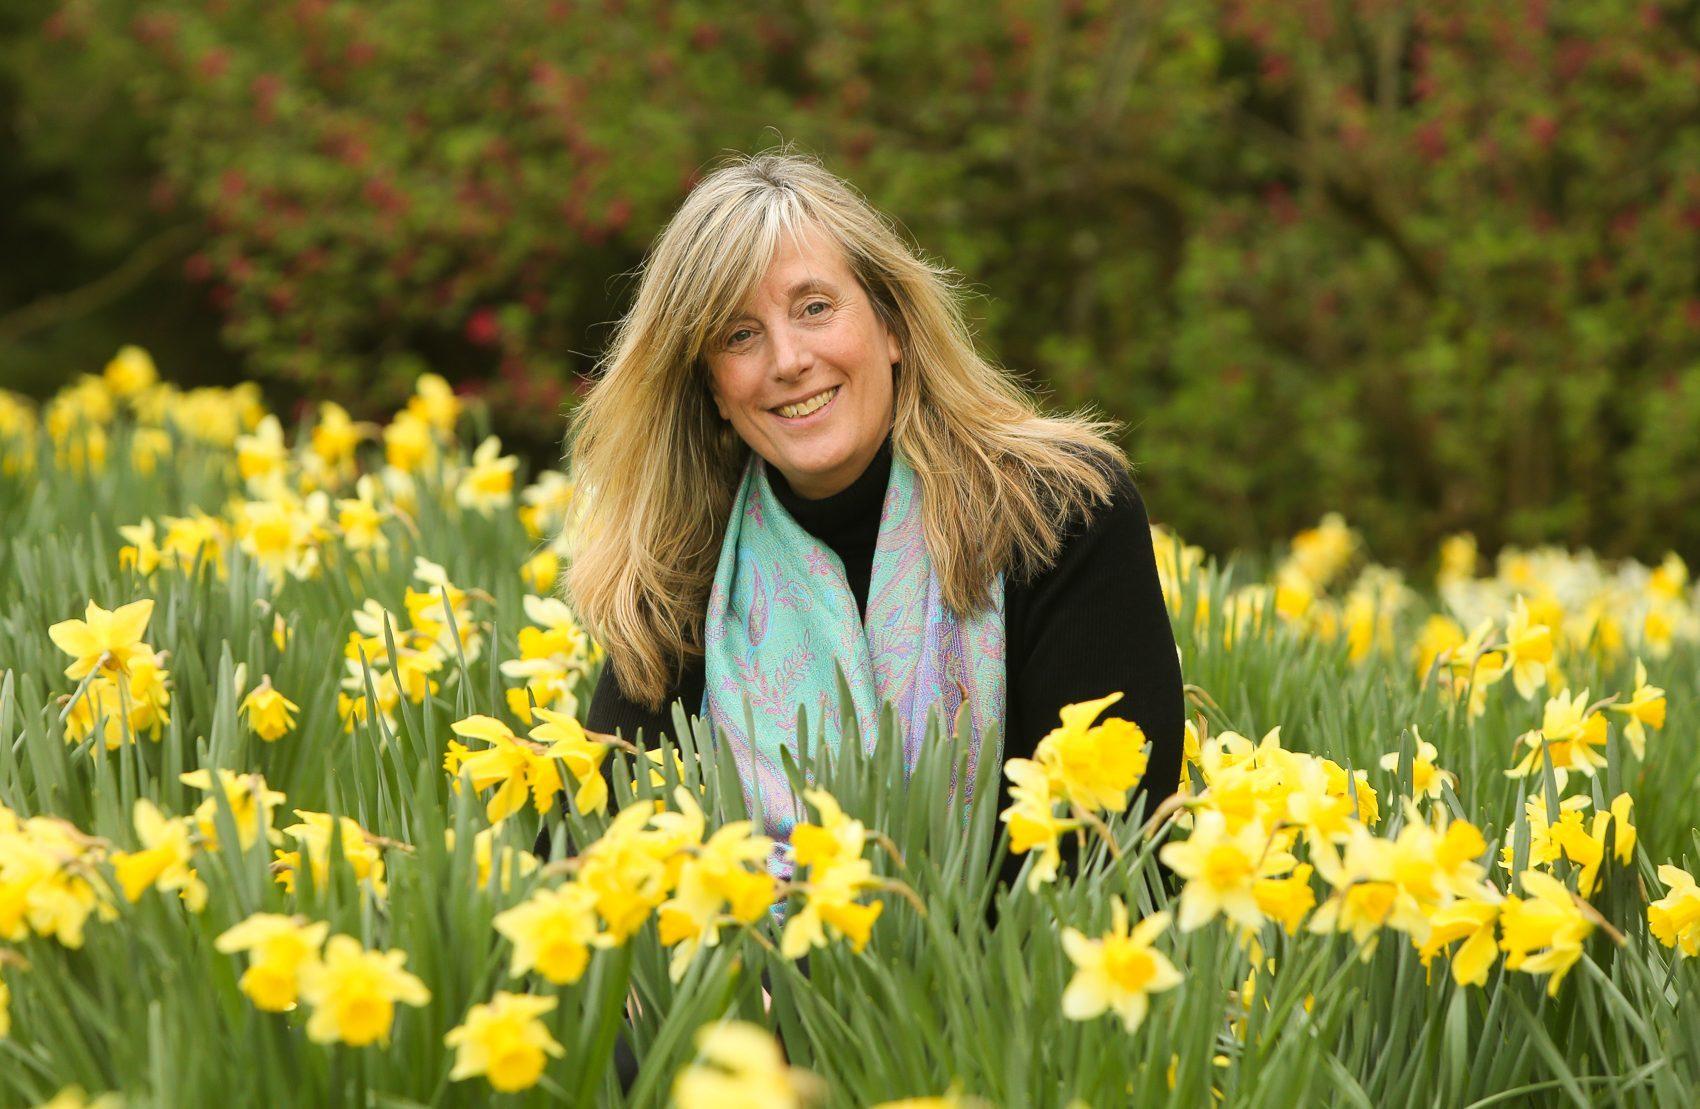 Caroline Thomson prepares for the weekend